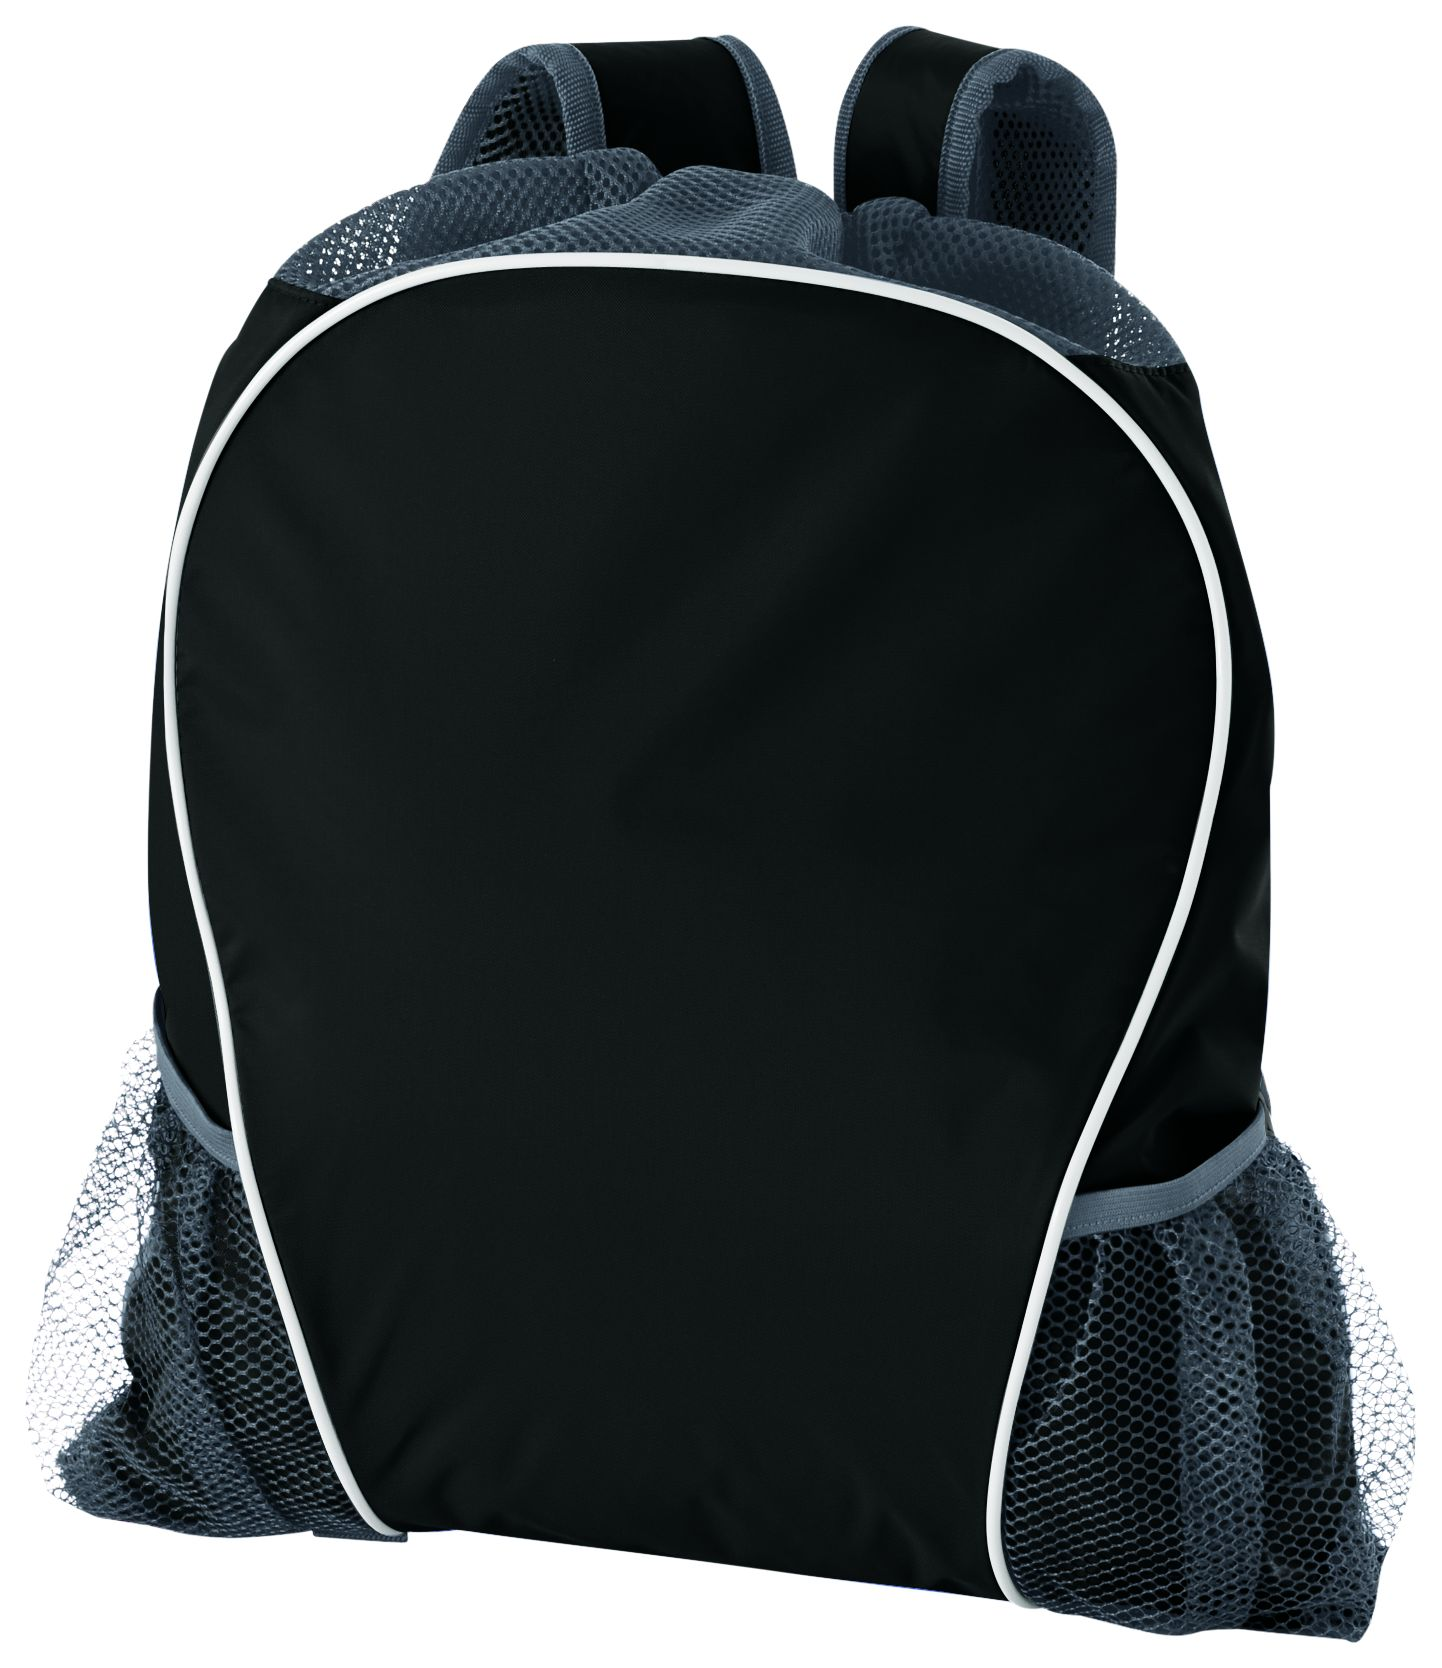 Rig Bag - BLACK/GRAPHITE/WHITE